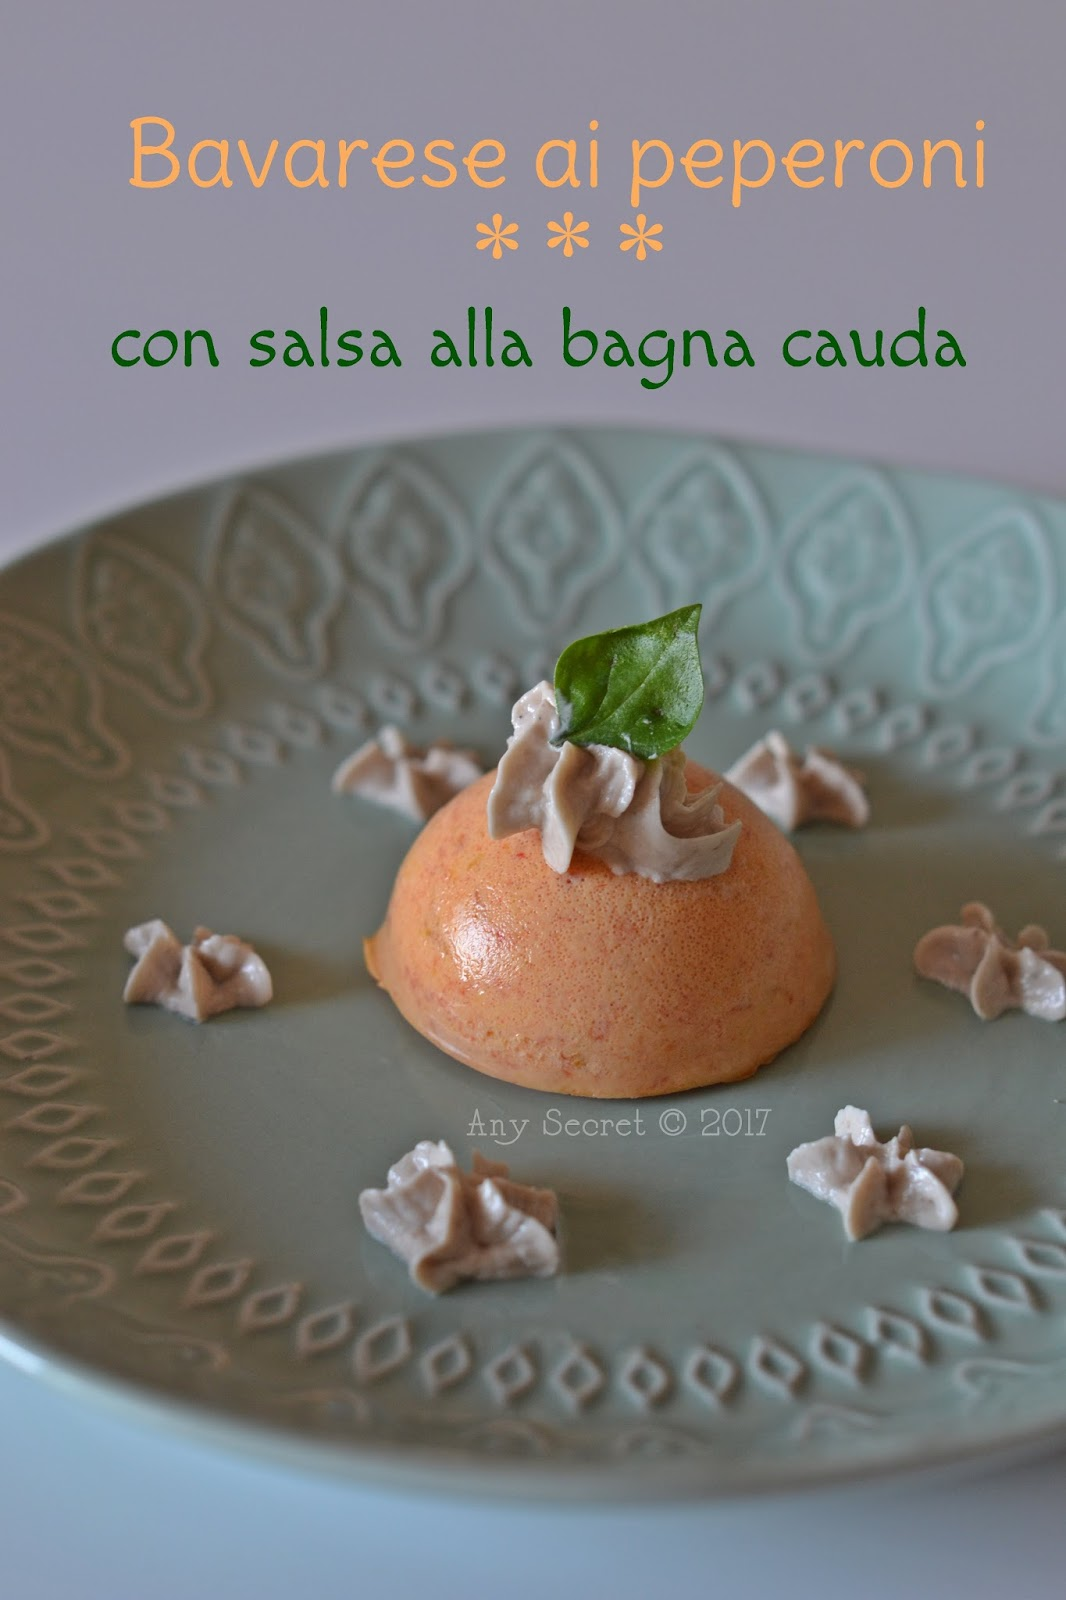 Any secret...: Bavarese ai peperoni con salsa alla bagna cauda